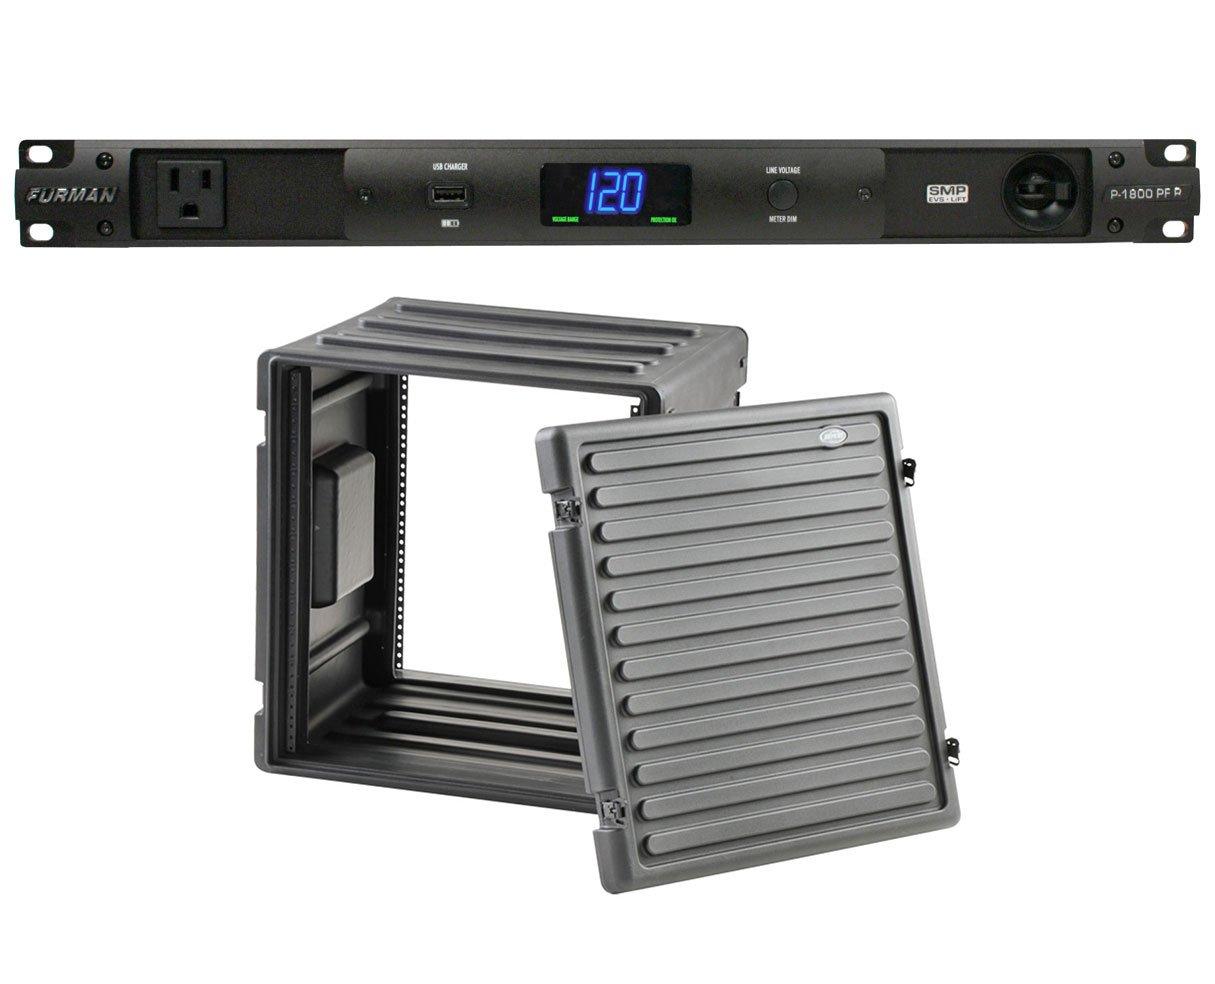 Furman P-1800 PF R 15 Amp Power Conditioner + SKB 1SKB-R12U Roto Molded 12U Rack